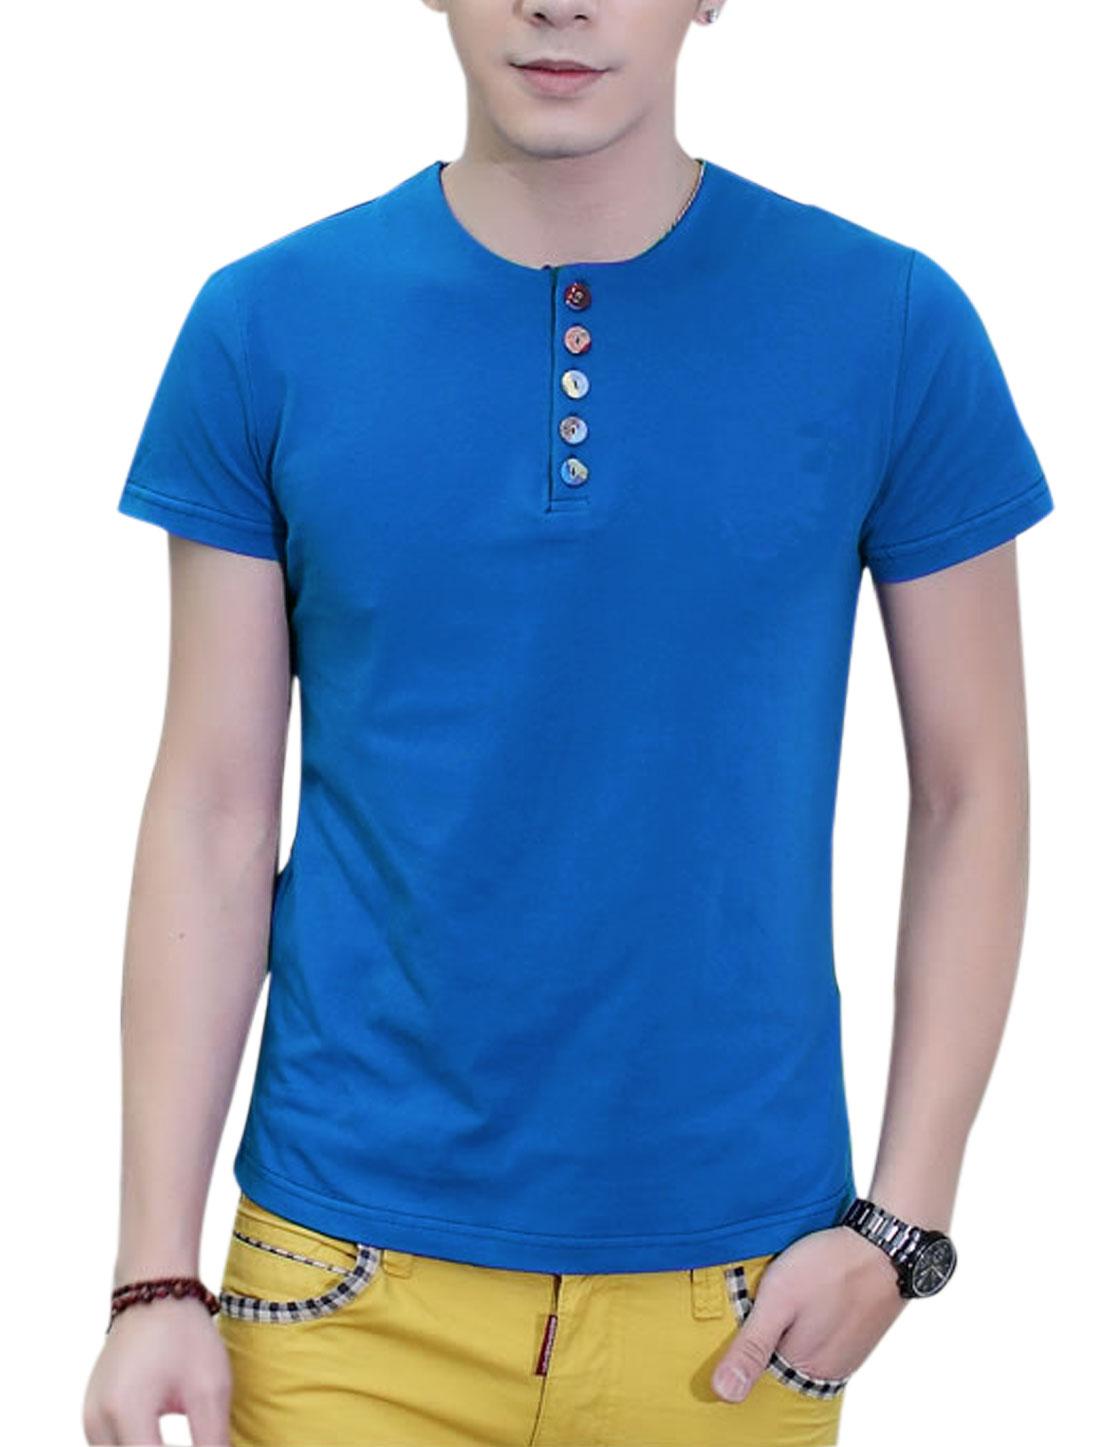 Round Neck Short Sleeve 1/4 Placket Summer T-Shirt for Men Royal Blue L